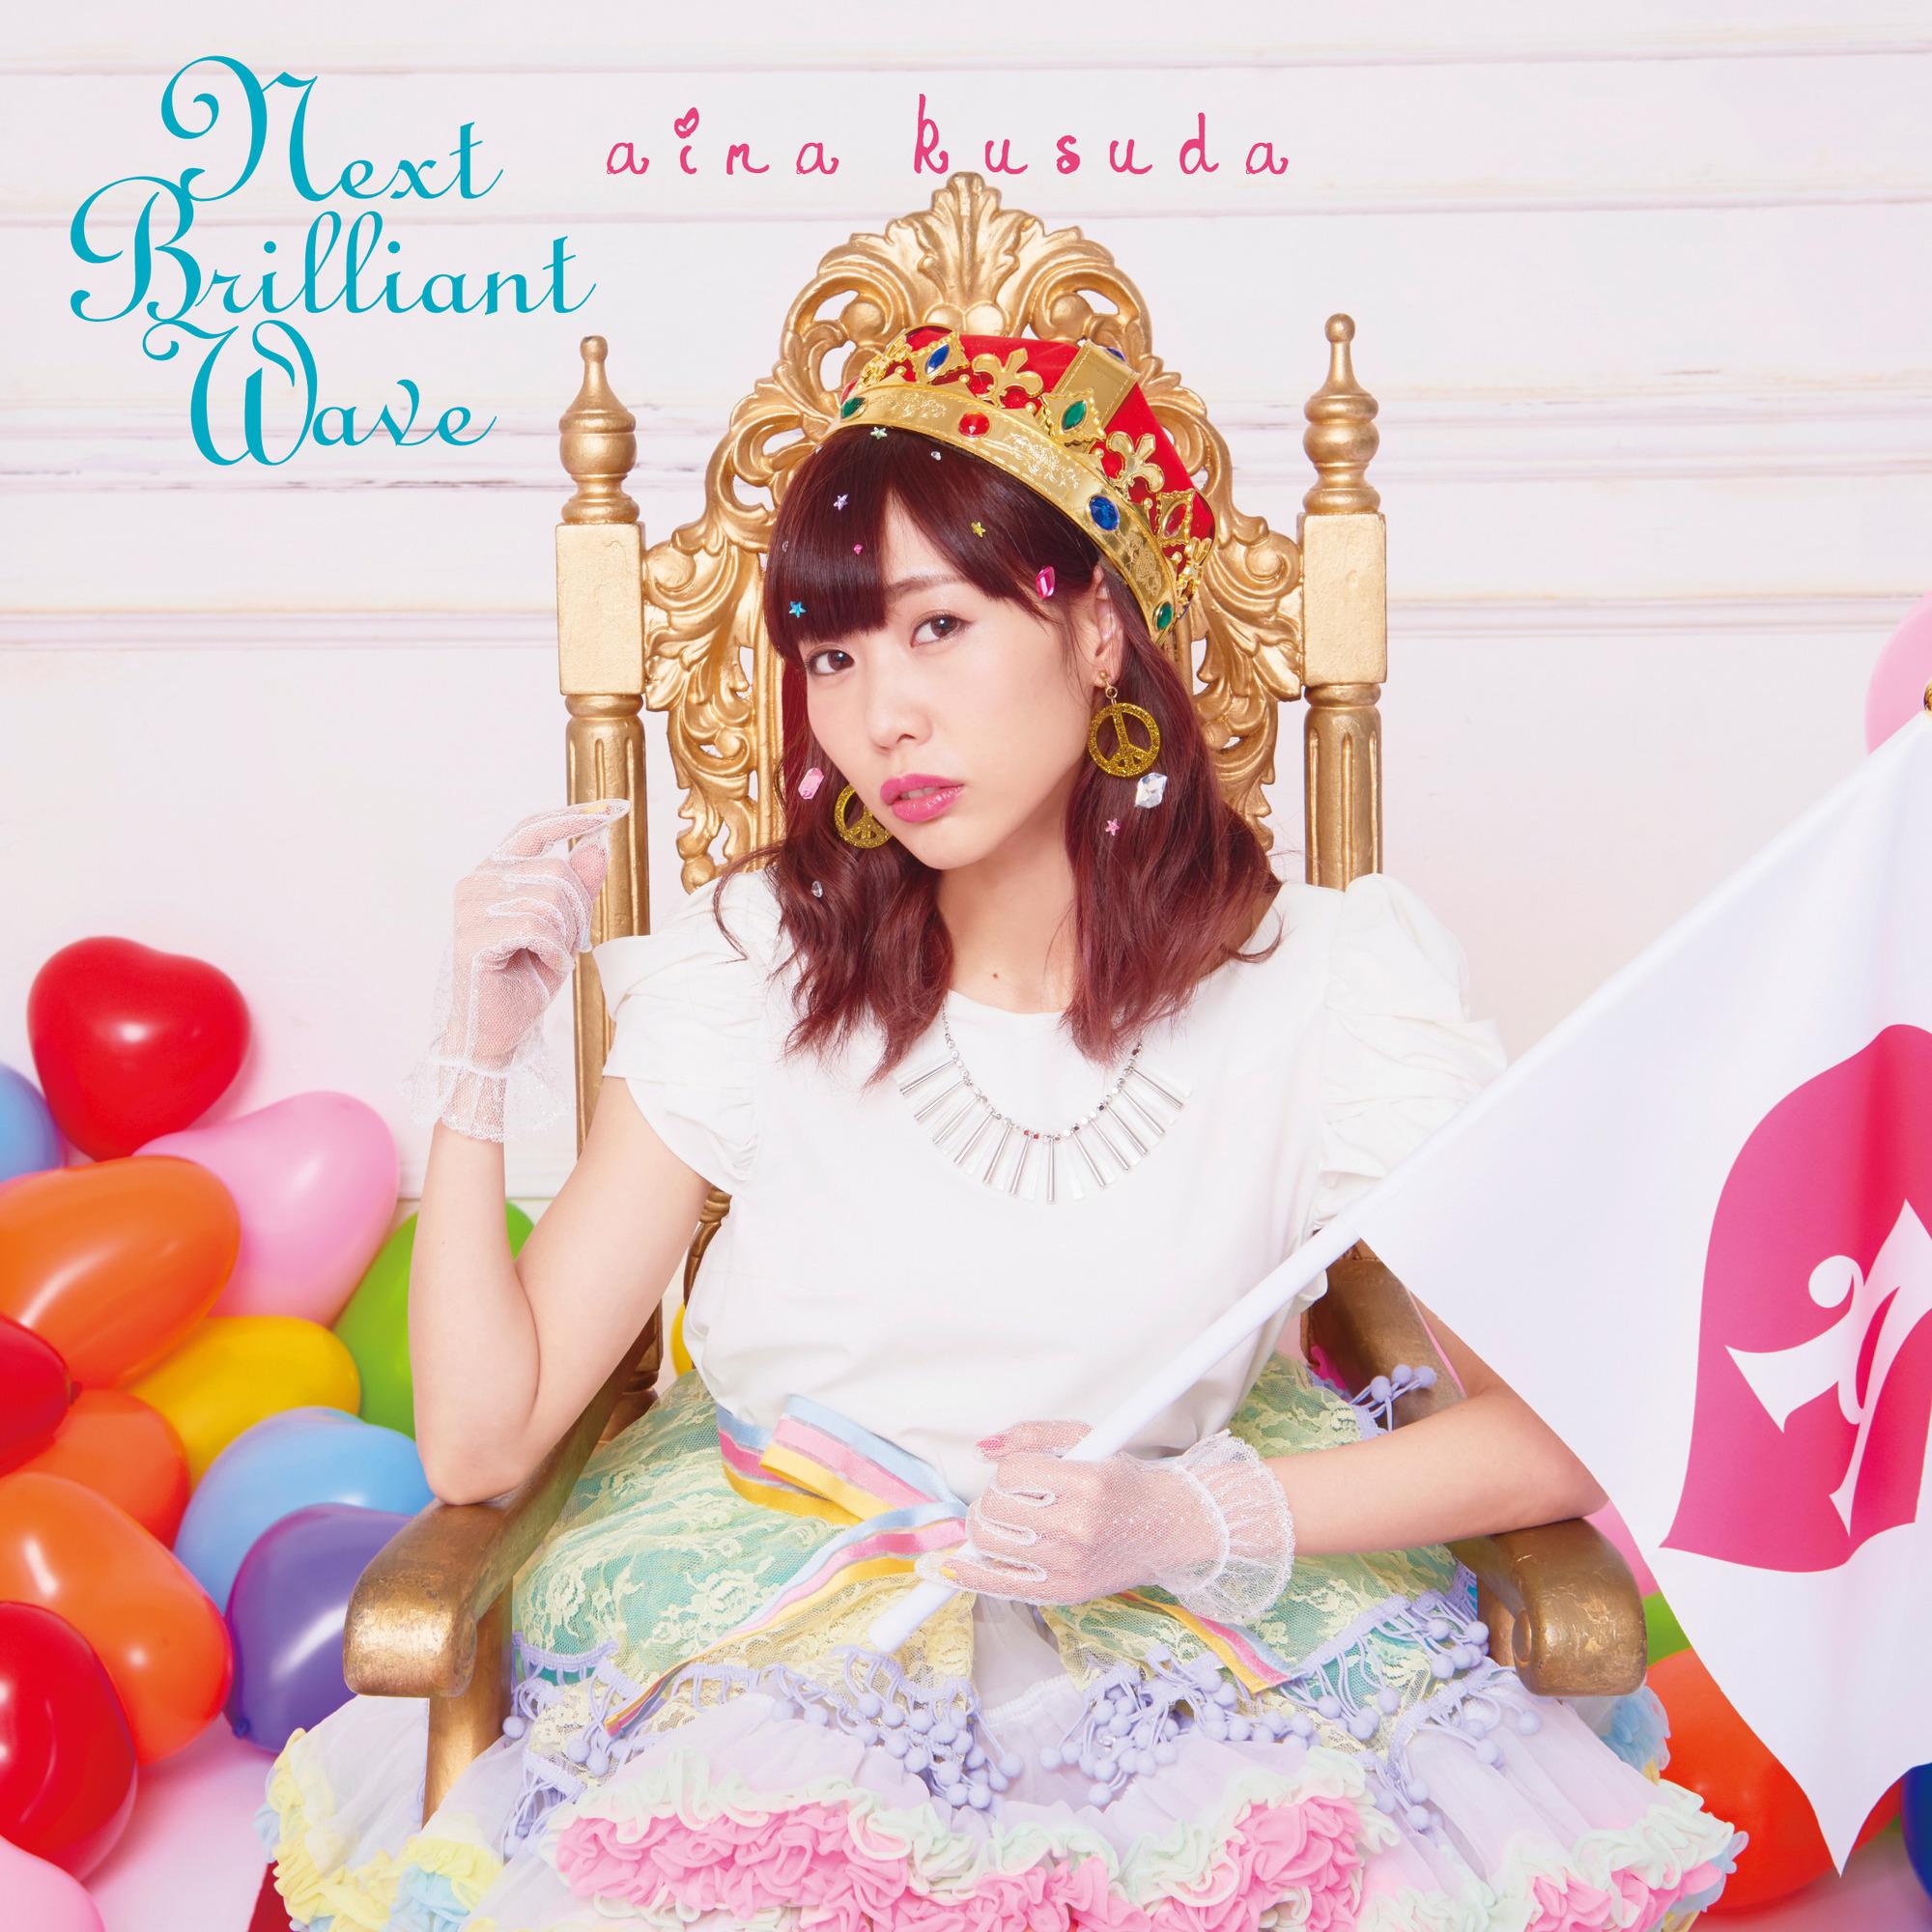 20160527.01.02 Aina Kusuda - Next Brilliant Wave cover.jpg